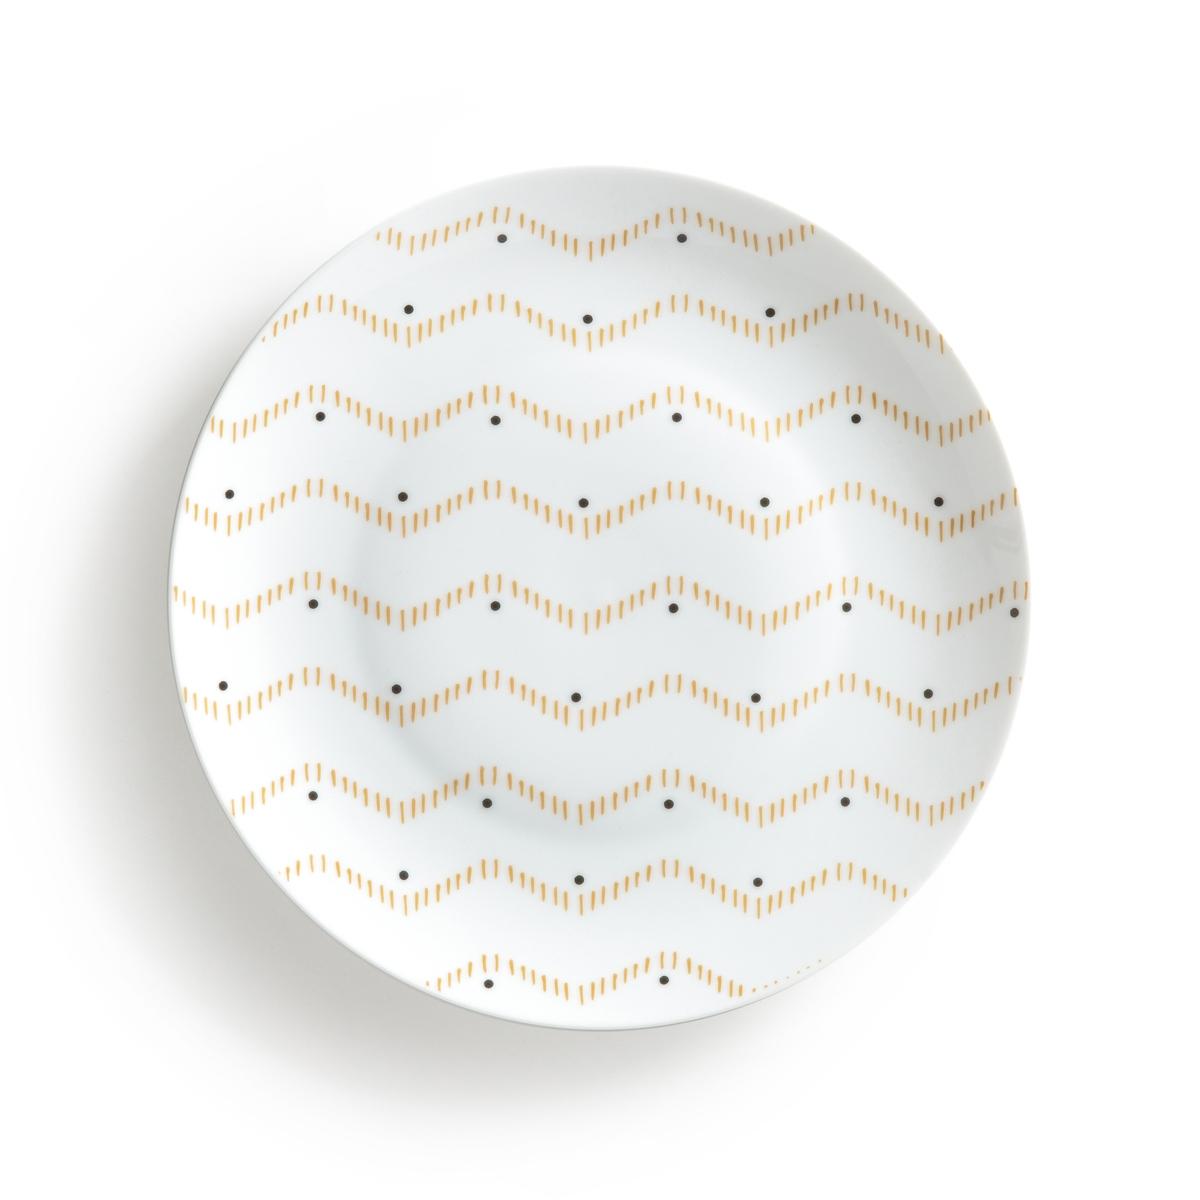 Тарелка плоская AFROA